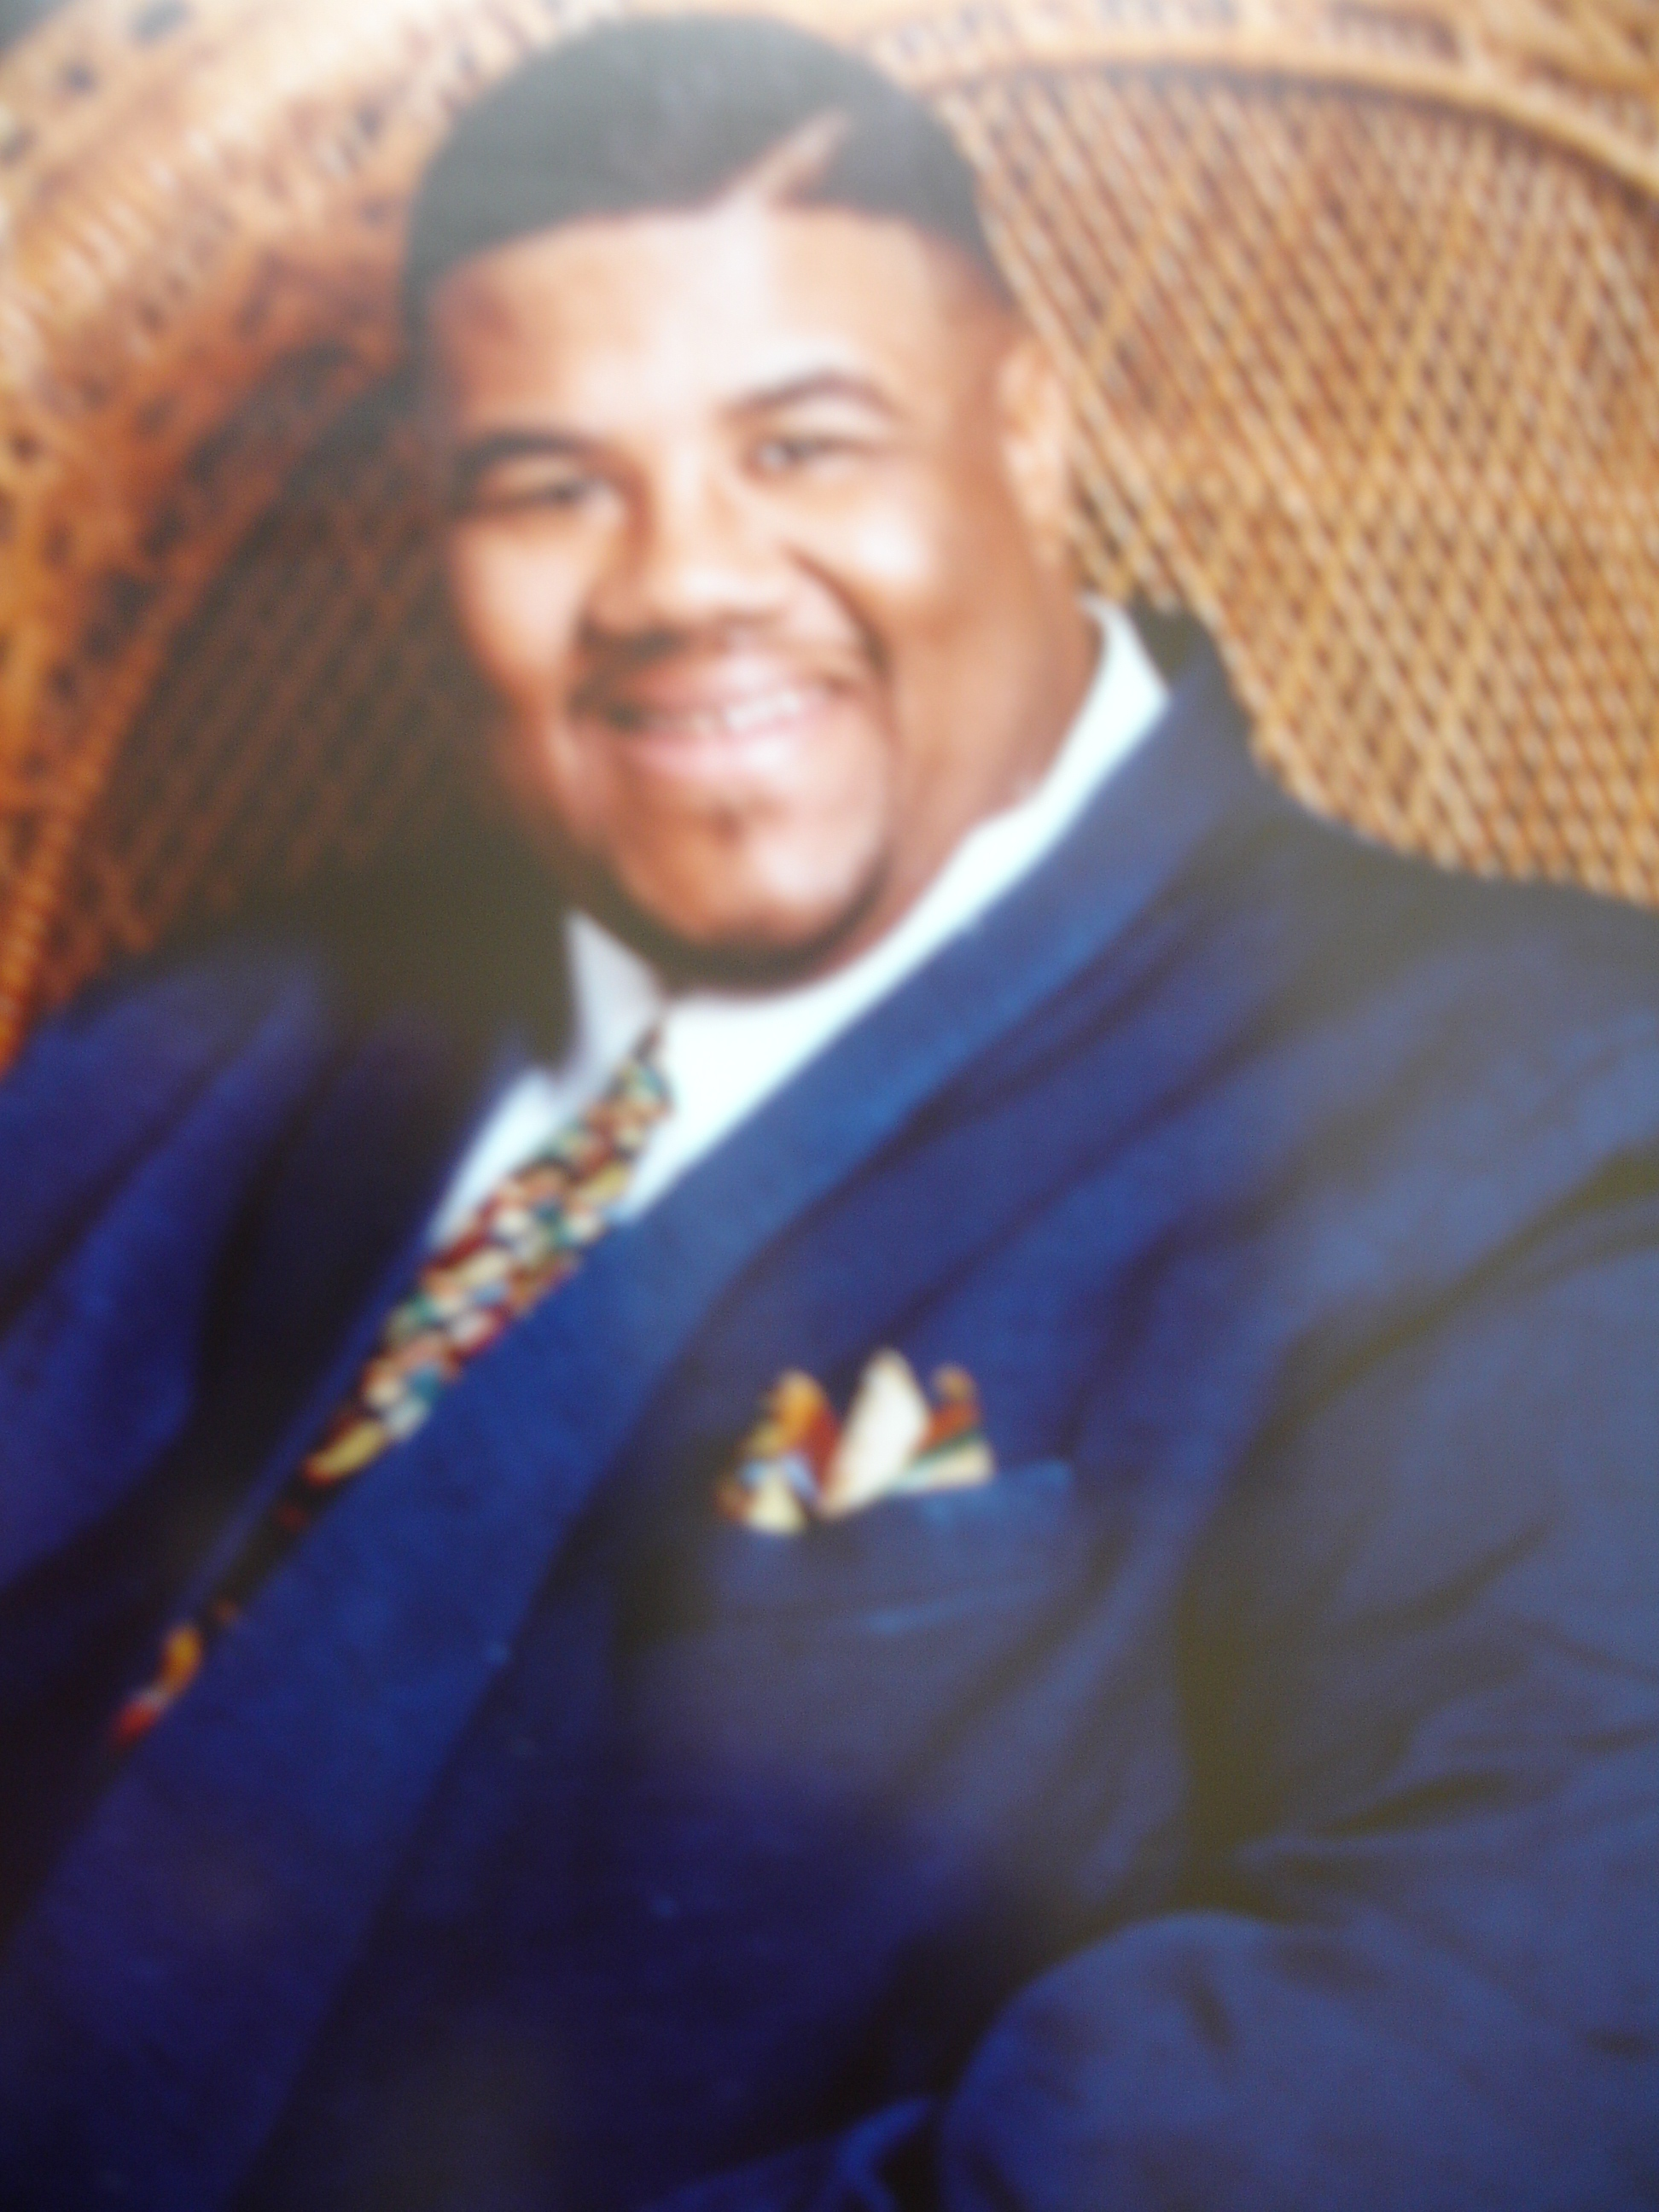 Rev. Adrien S. Johnson 1989 - 2004